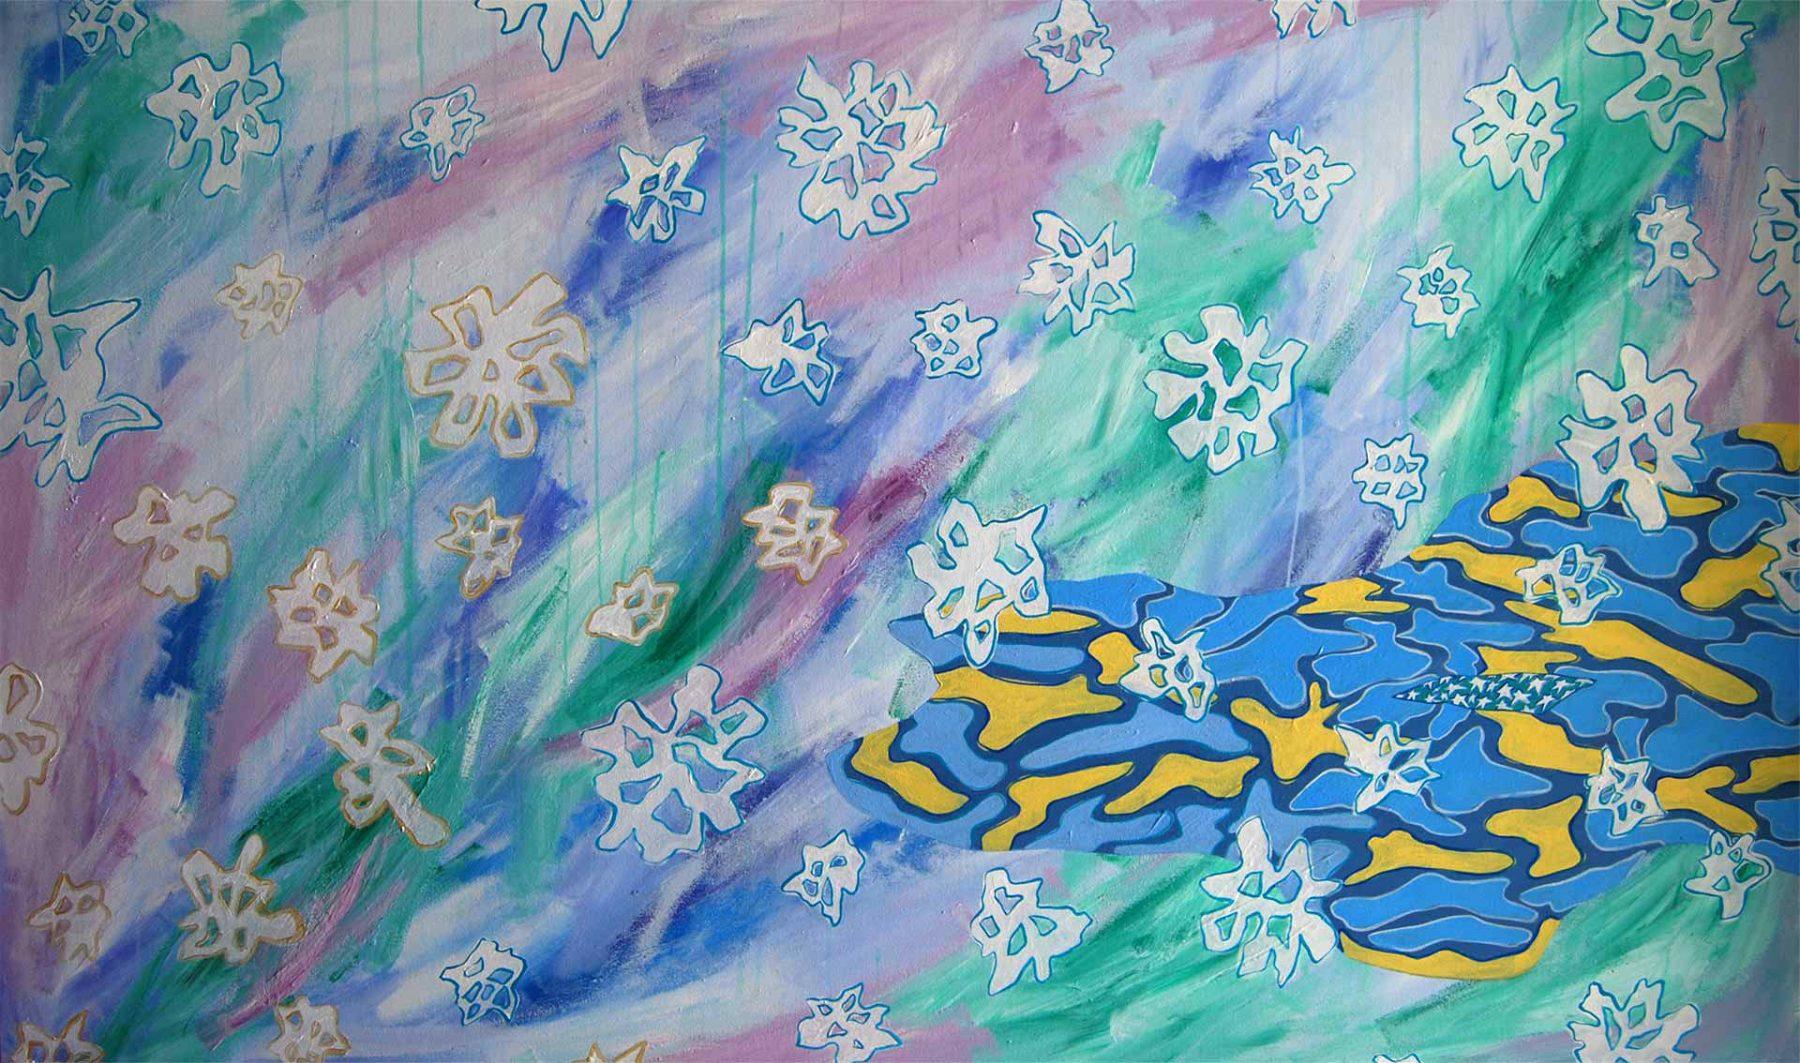 Winter Isha Landscape (2008) acrylic on canvas, 0.91H x 1.52W meters